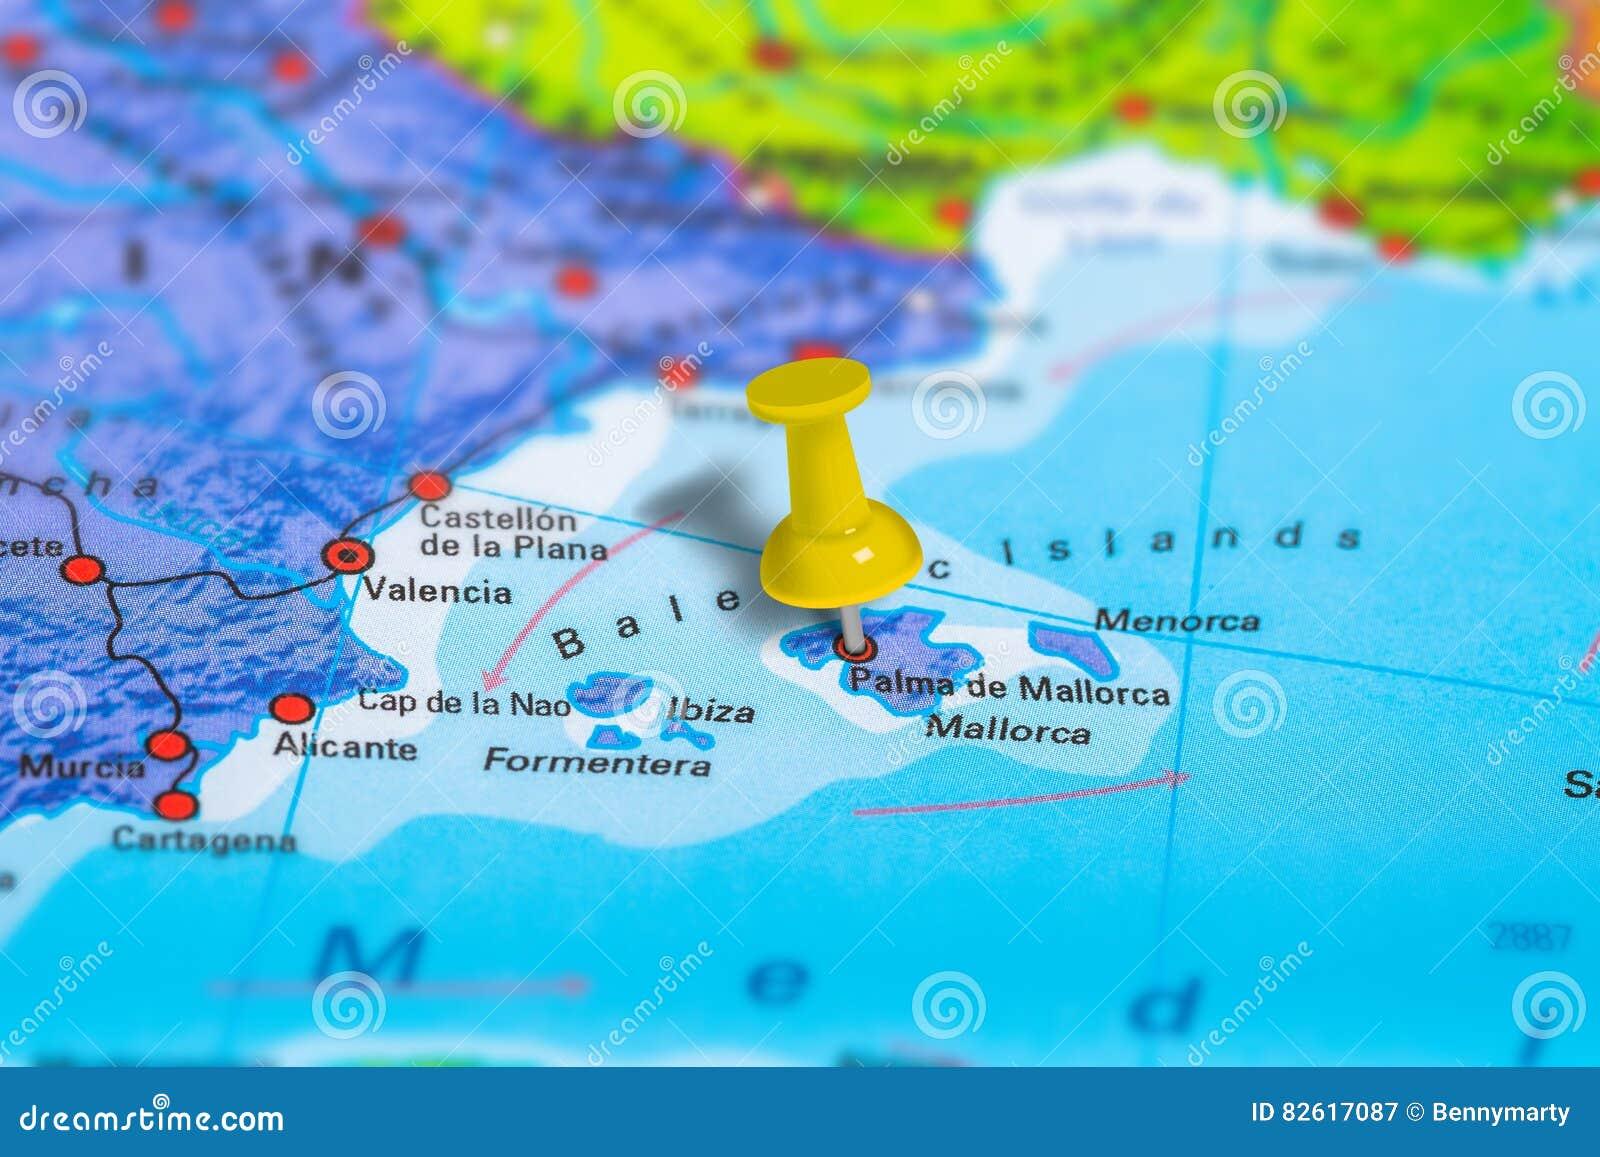 Mapa De Palma De Mallorca Spain Imagem De Stock Imagem De